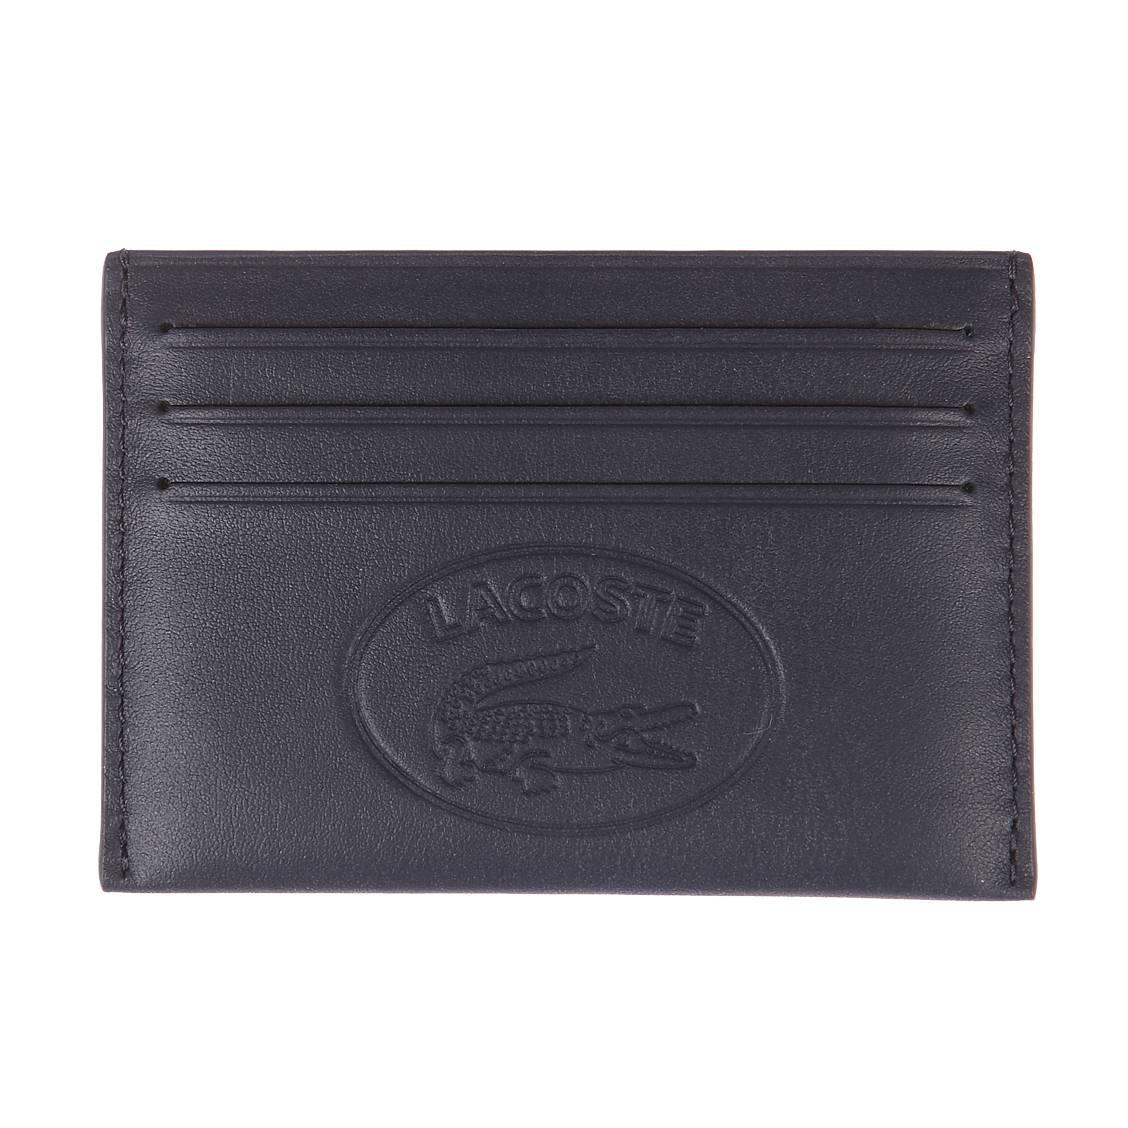 eb83602273 Porte-cartes italien l.12.12 en cuir de vache bleu marine avec logo embossé